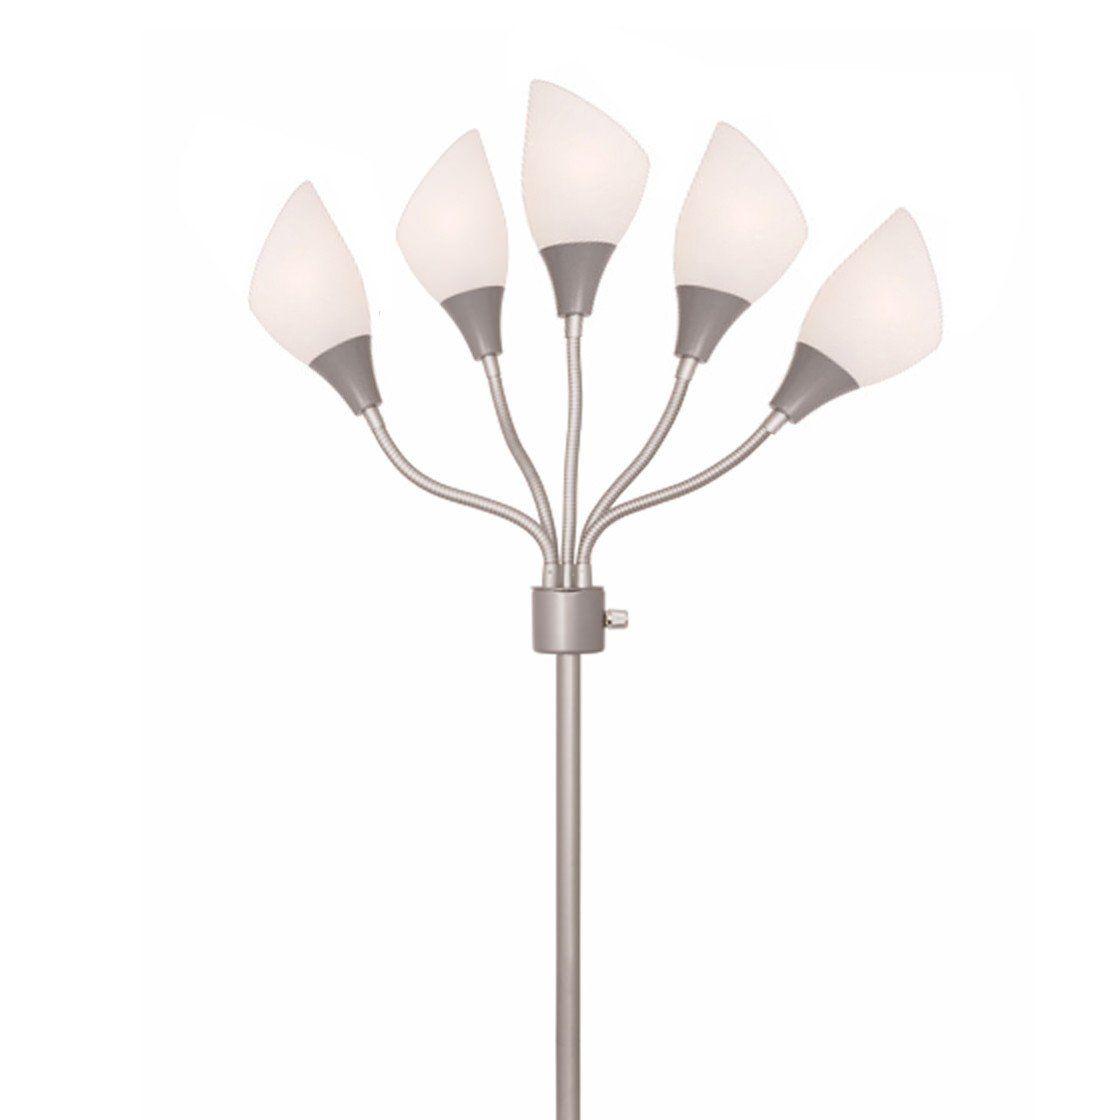 Park Art|My WordPress Blog_5 Arm Floor Lamp Replacement Shades